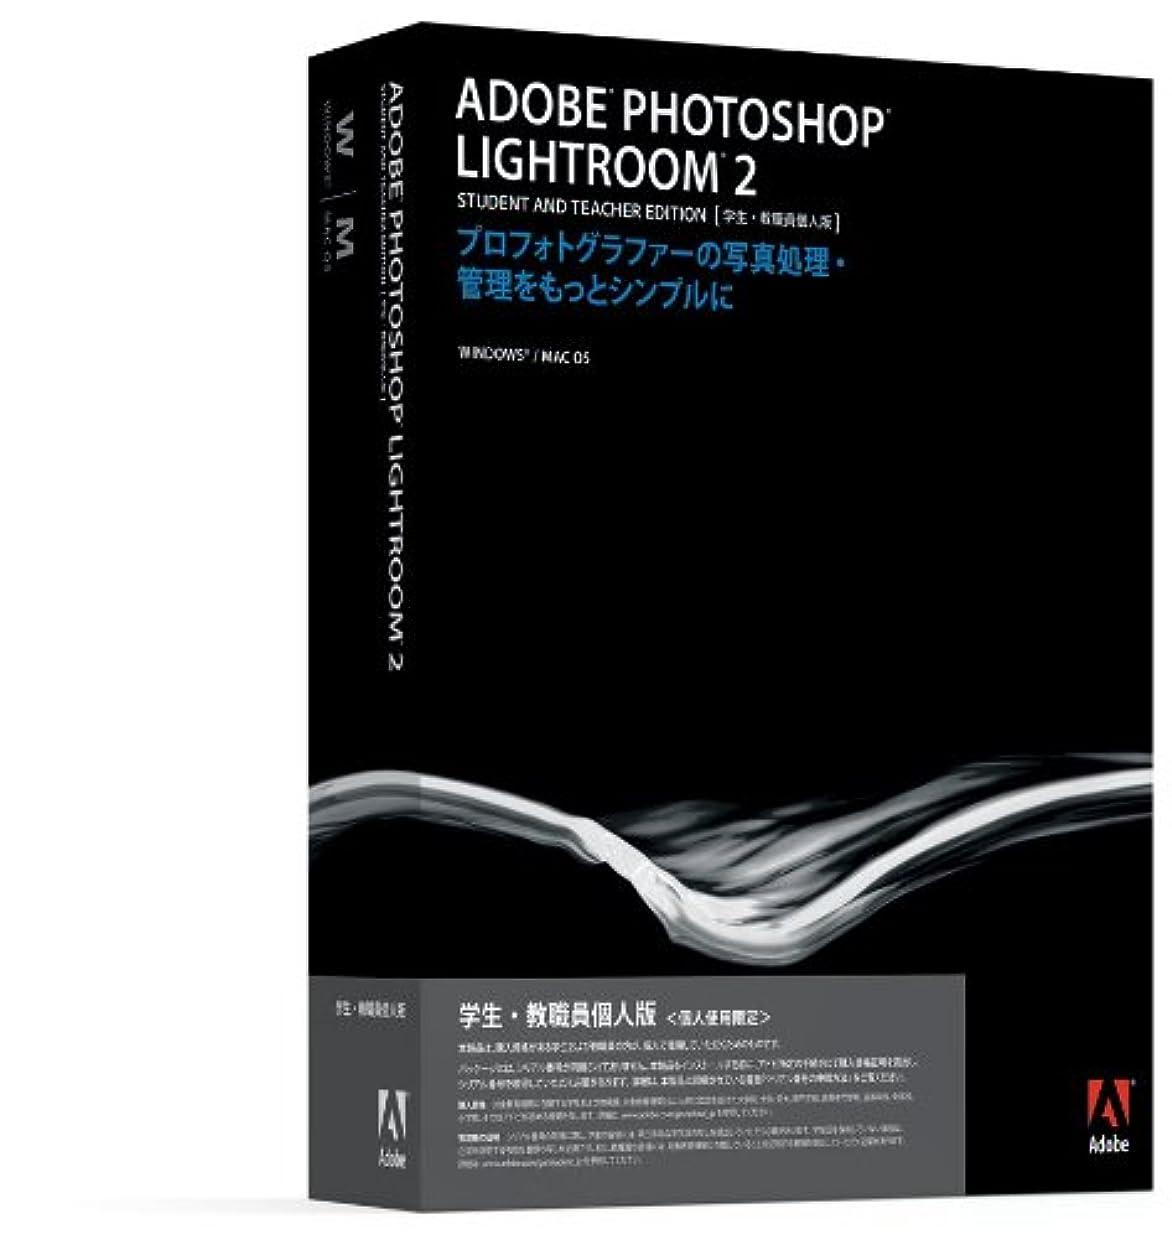 書士喪モード学生?教職員個人版 Adobe Photoshop Lightroom 2.0 日本語版 Windows/Macintosh版 (要シリアル番号申請)